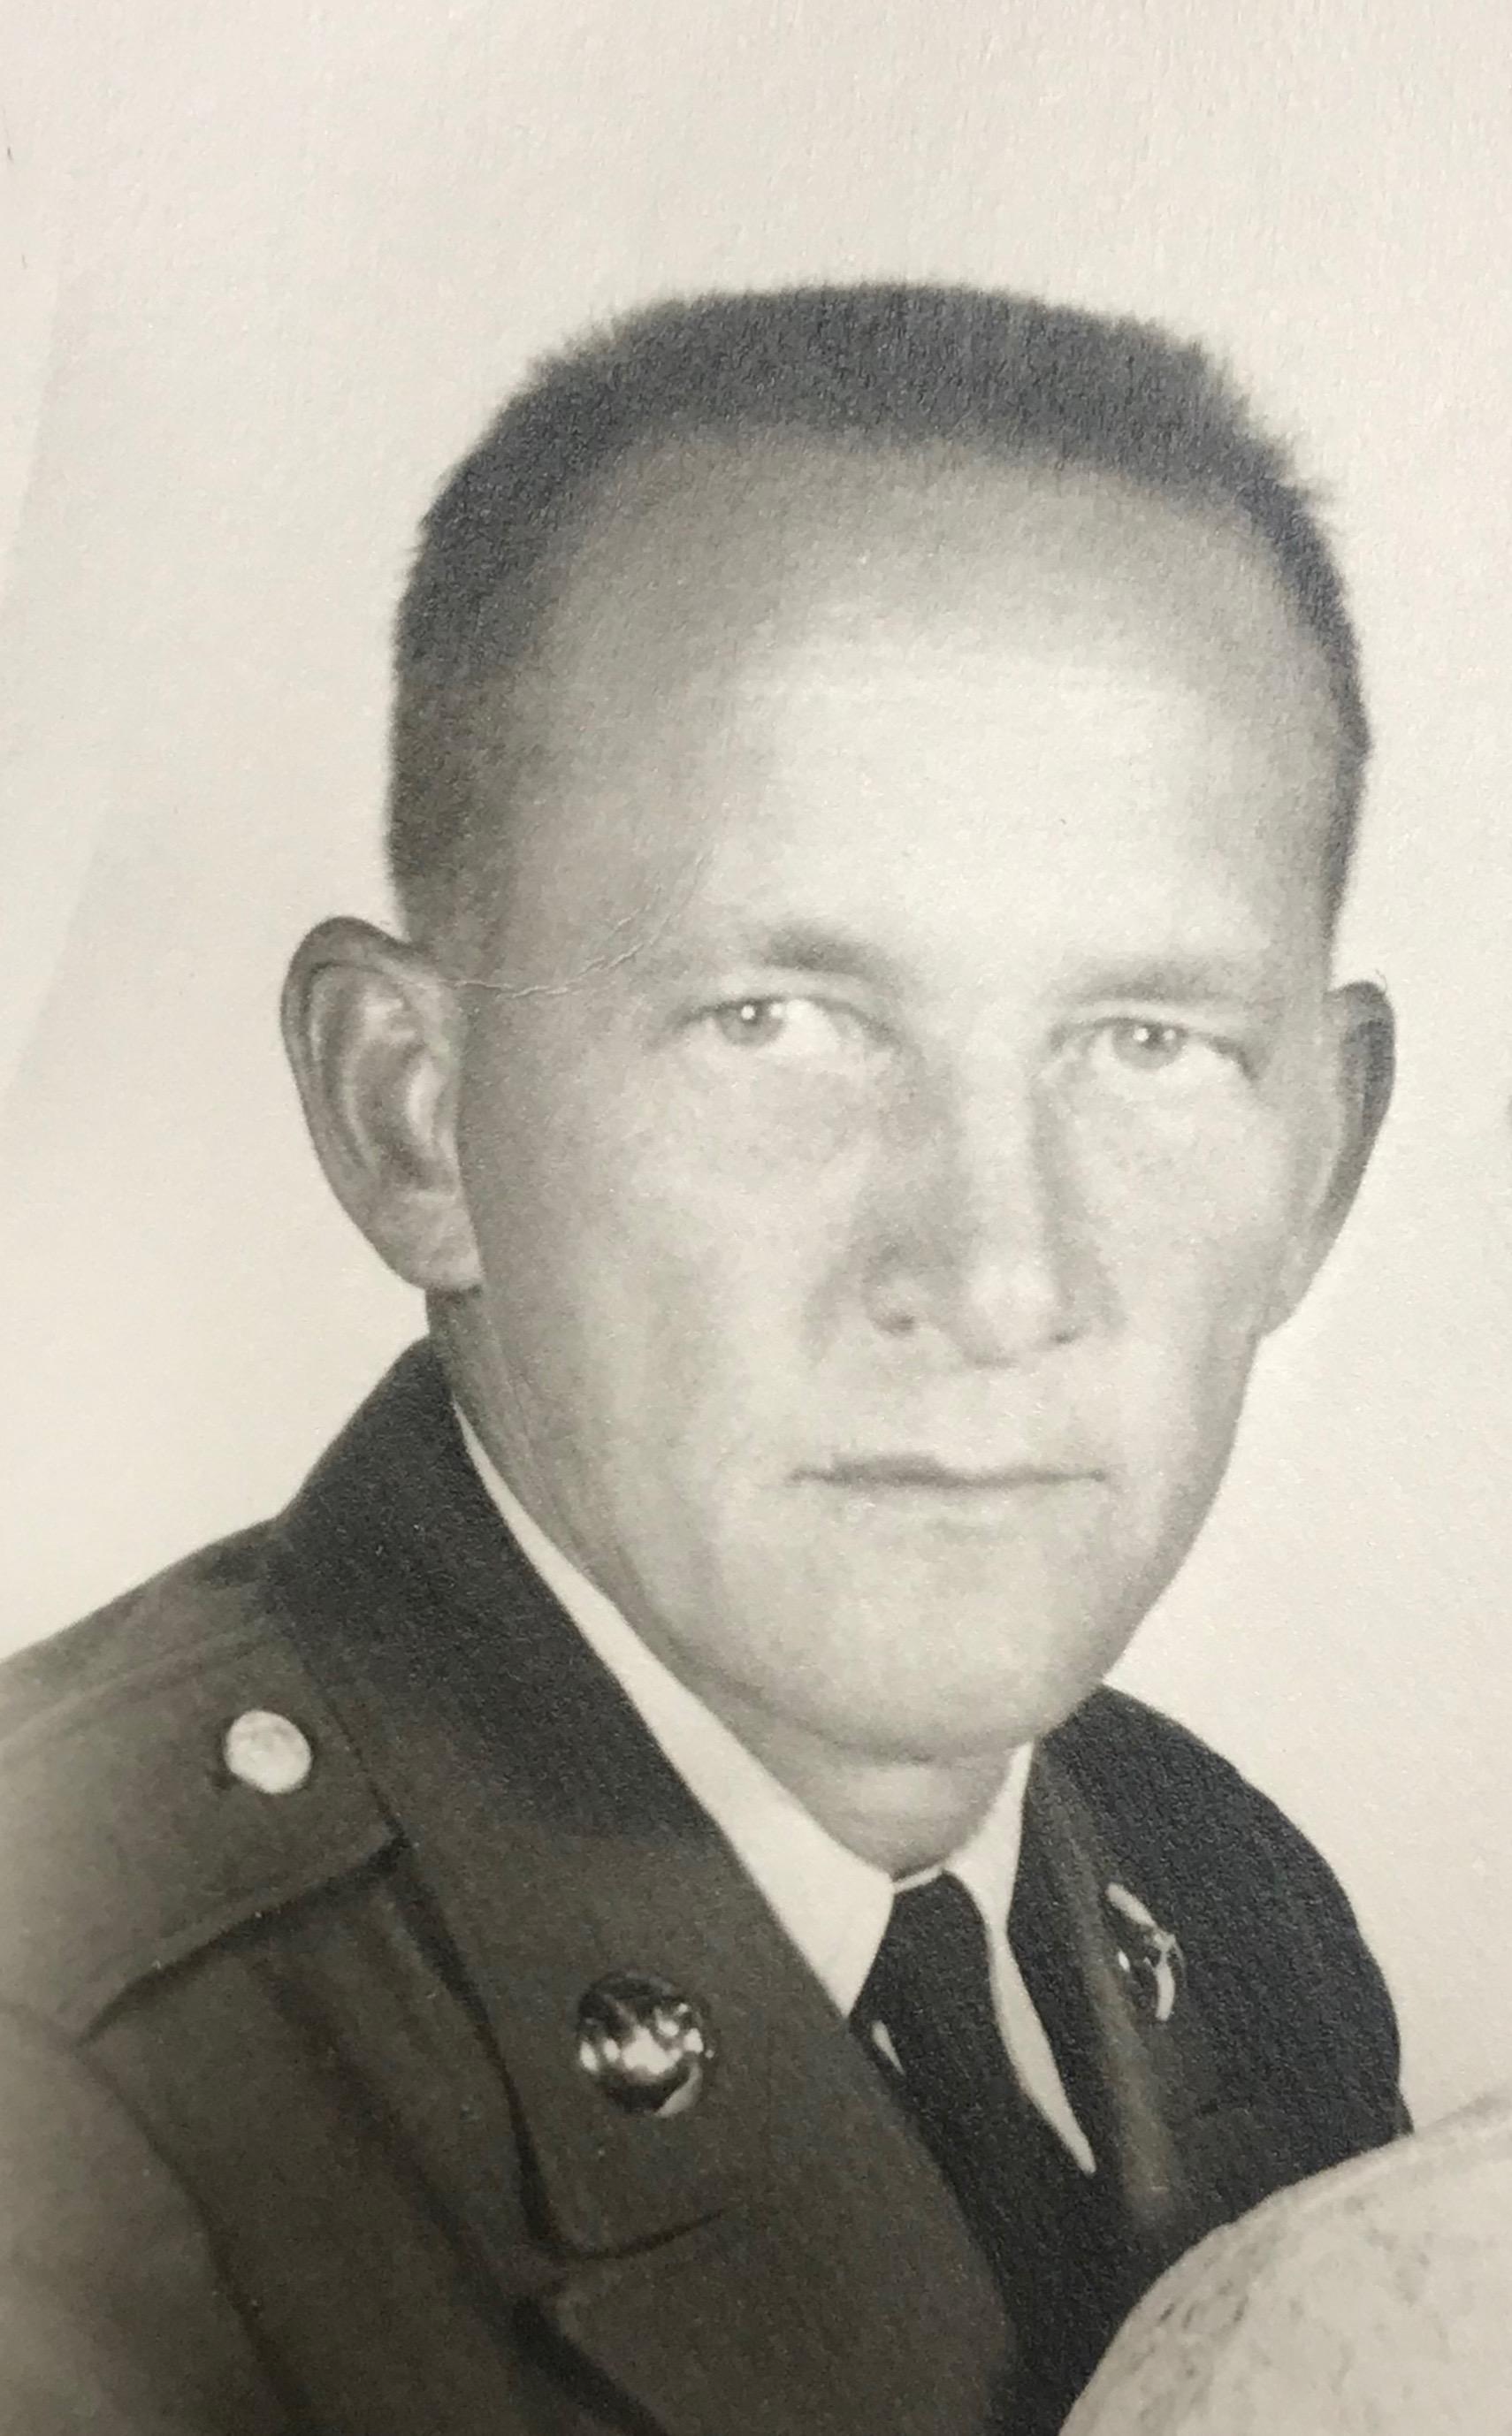 Kenneth E. Beckman